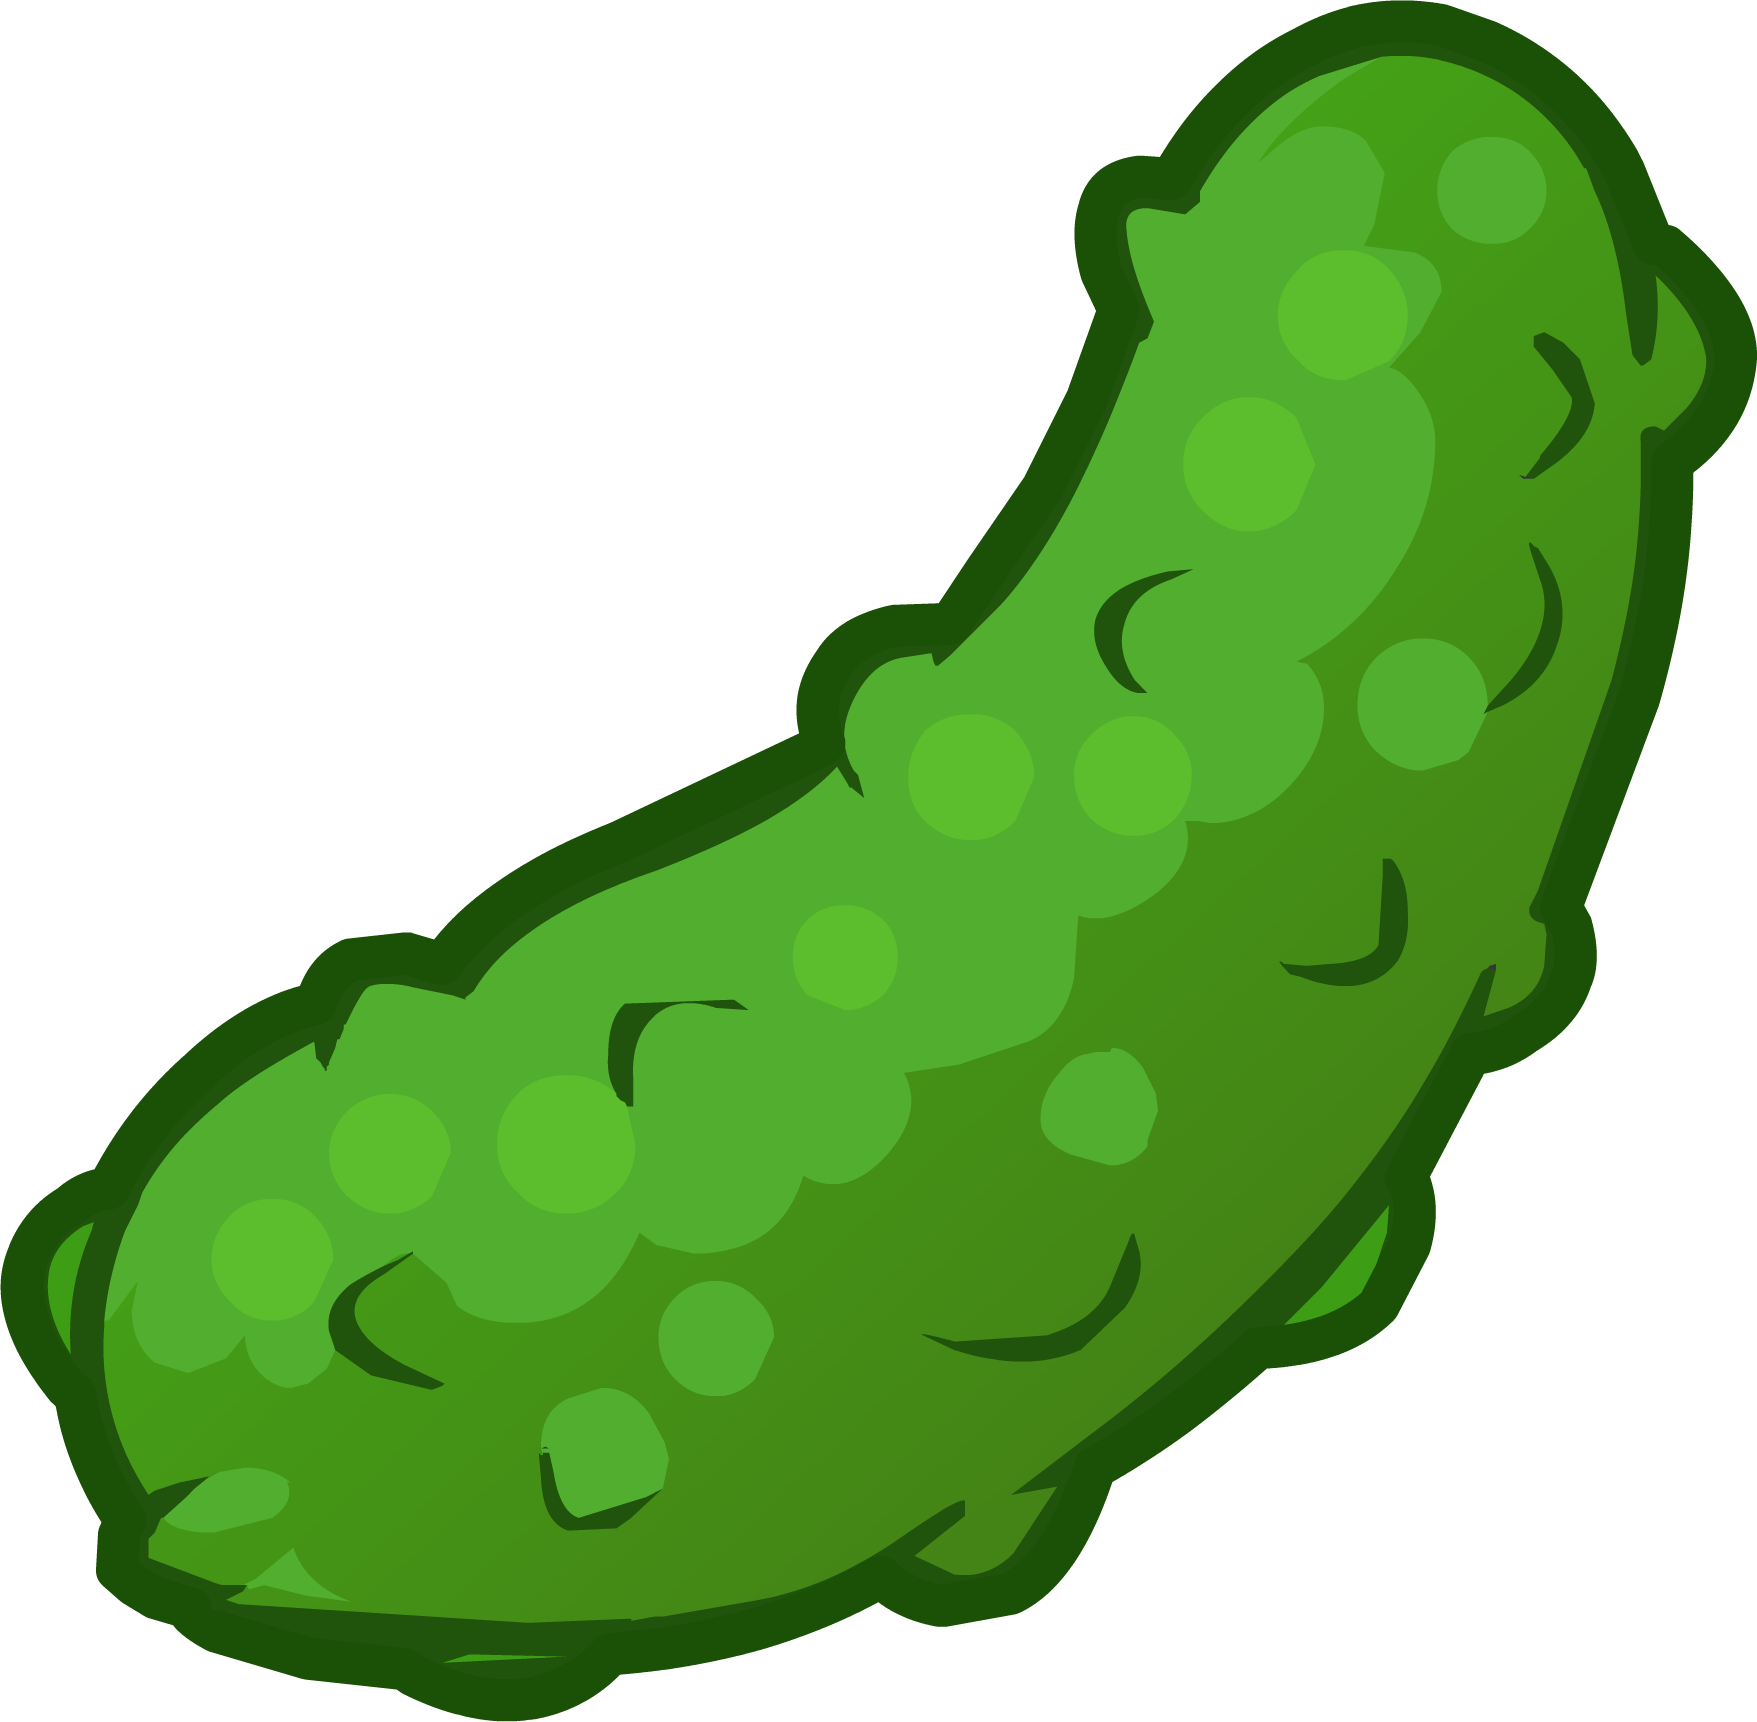 Pickle Clip Art Cliparts Co-Pickle Clip Art Cliparts Co-4